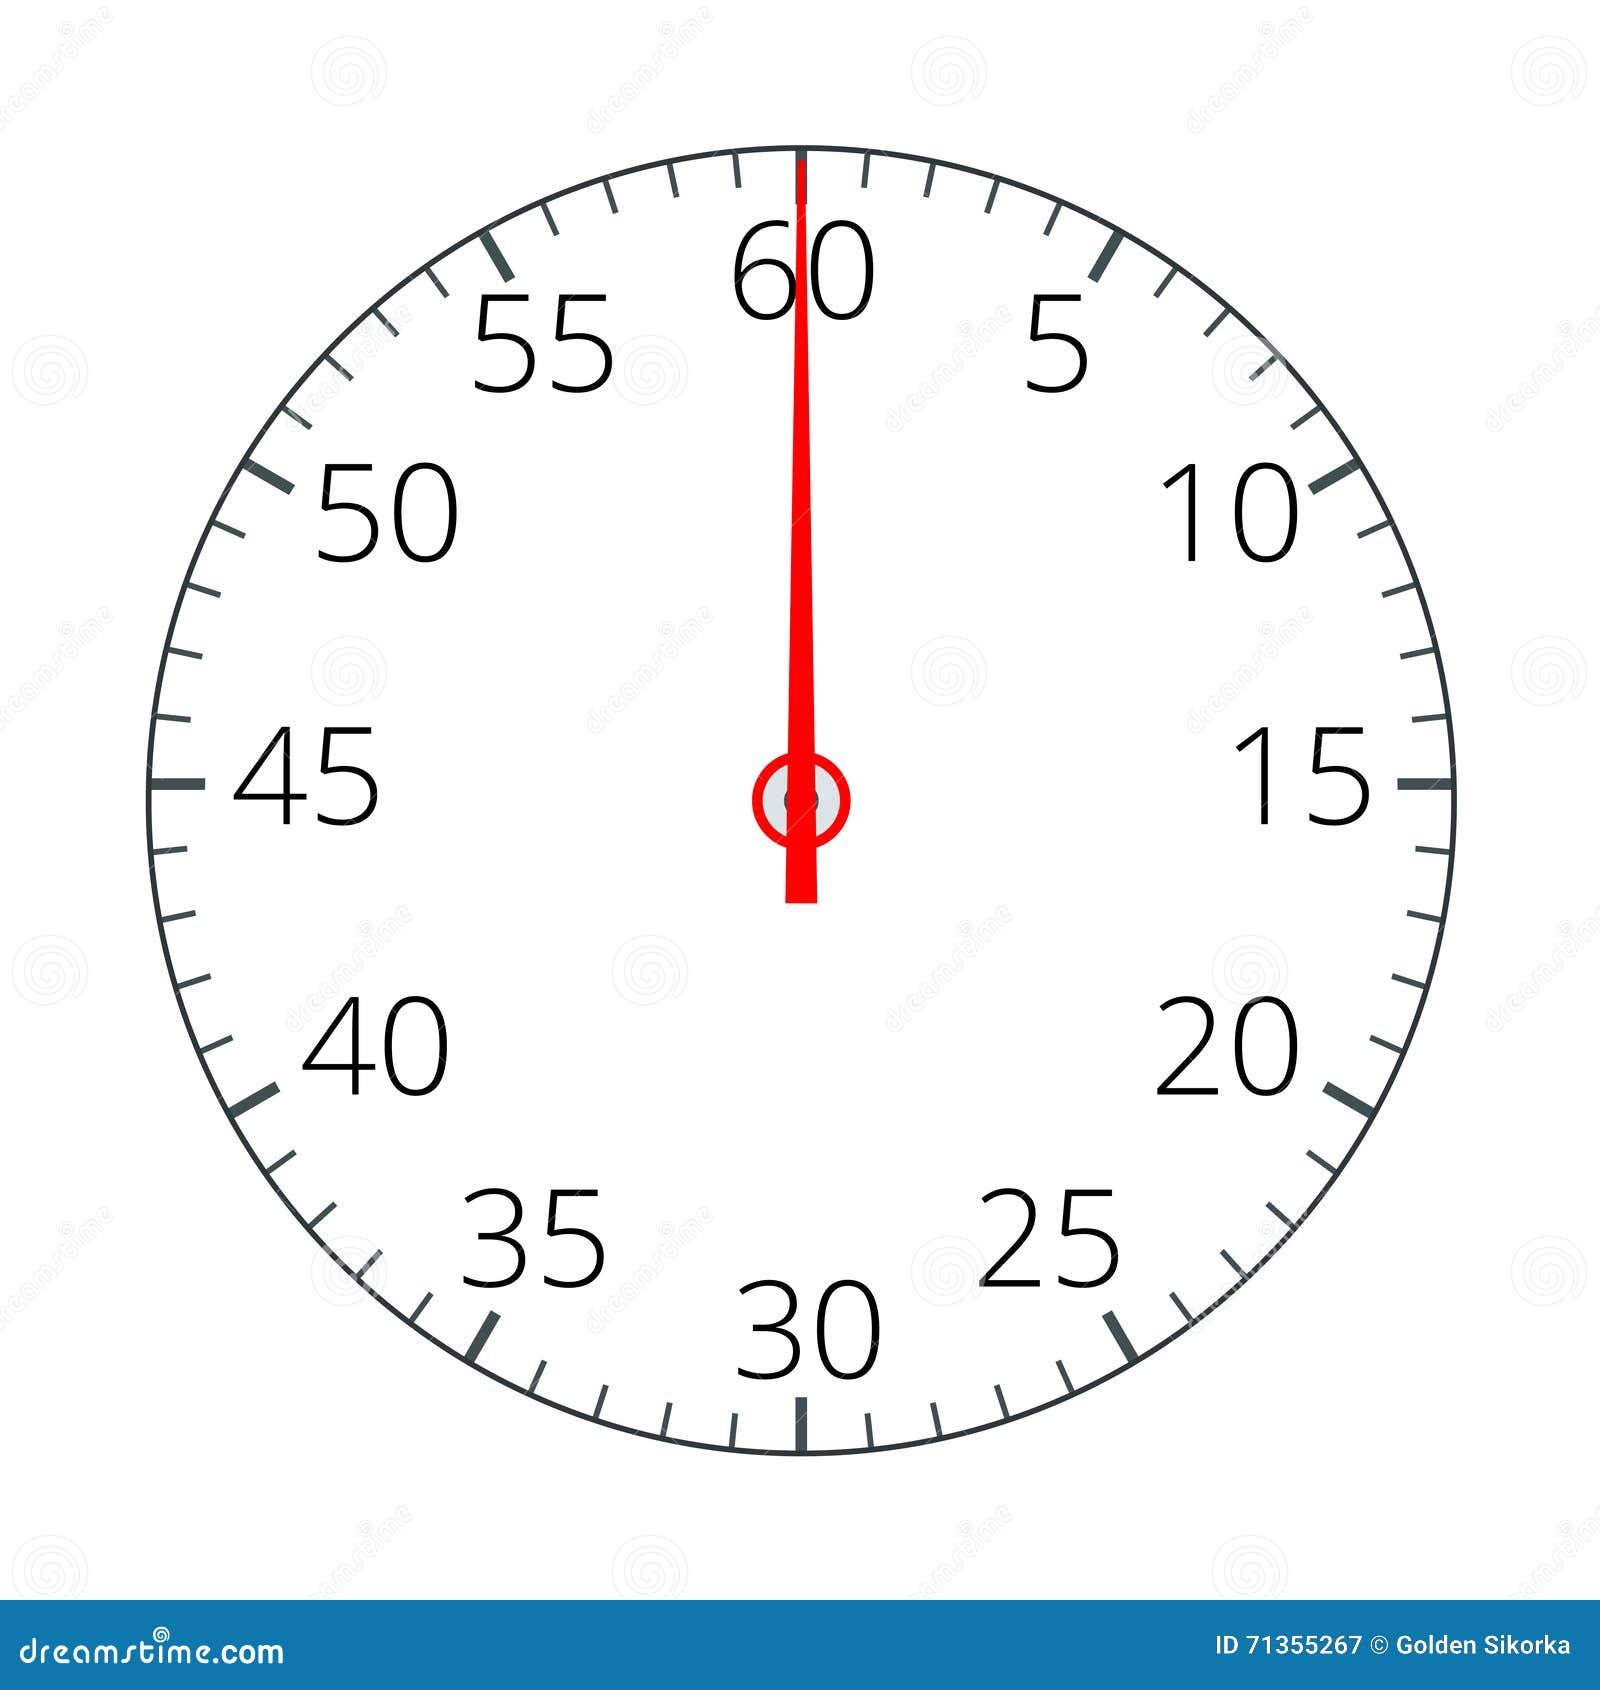 Cronómetro Icono del cronómetro Icono del cronómetro plano Ejemplo plano del vector 3d